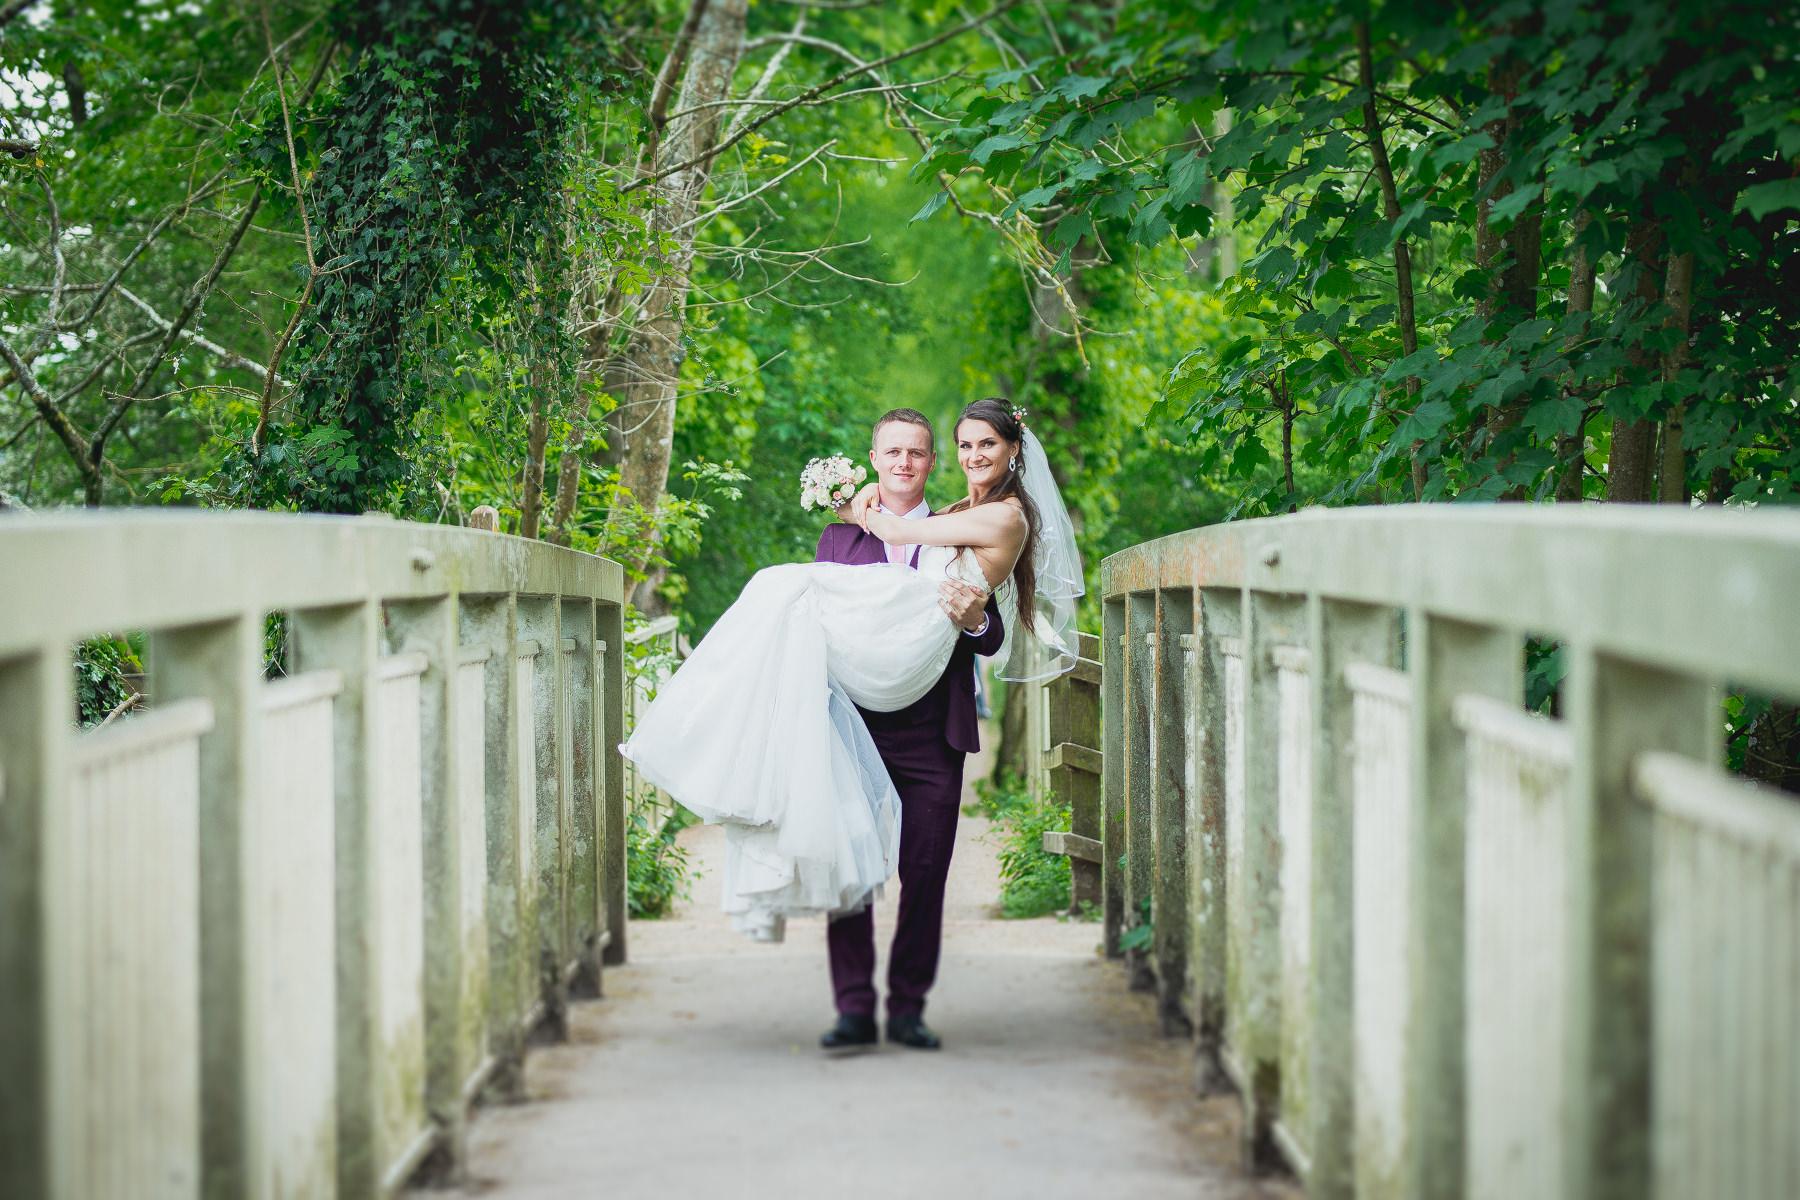 Dangira & Ignas Arundel Sussex Weddings 2.jpg